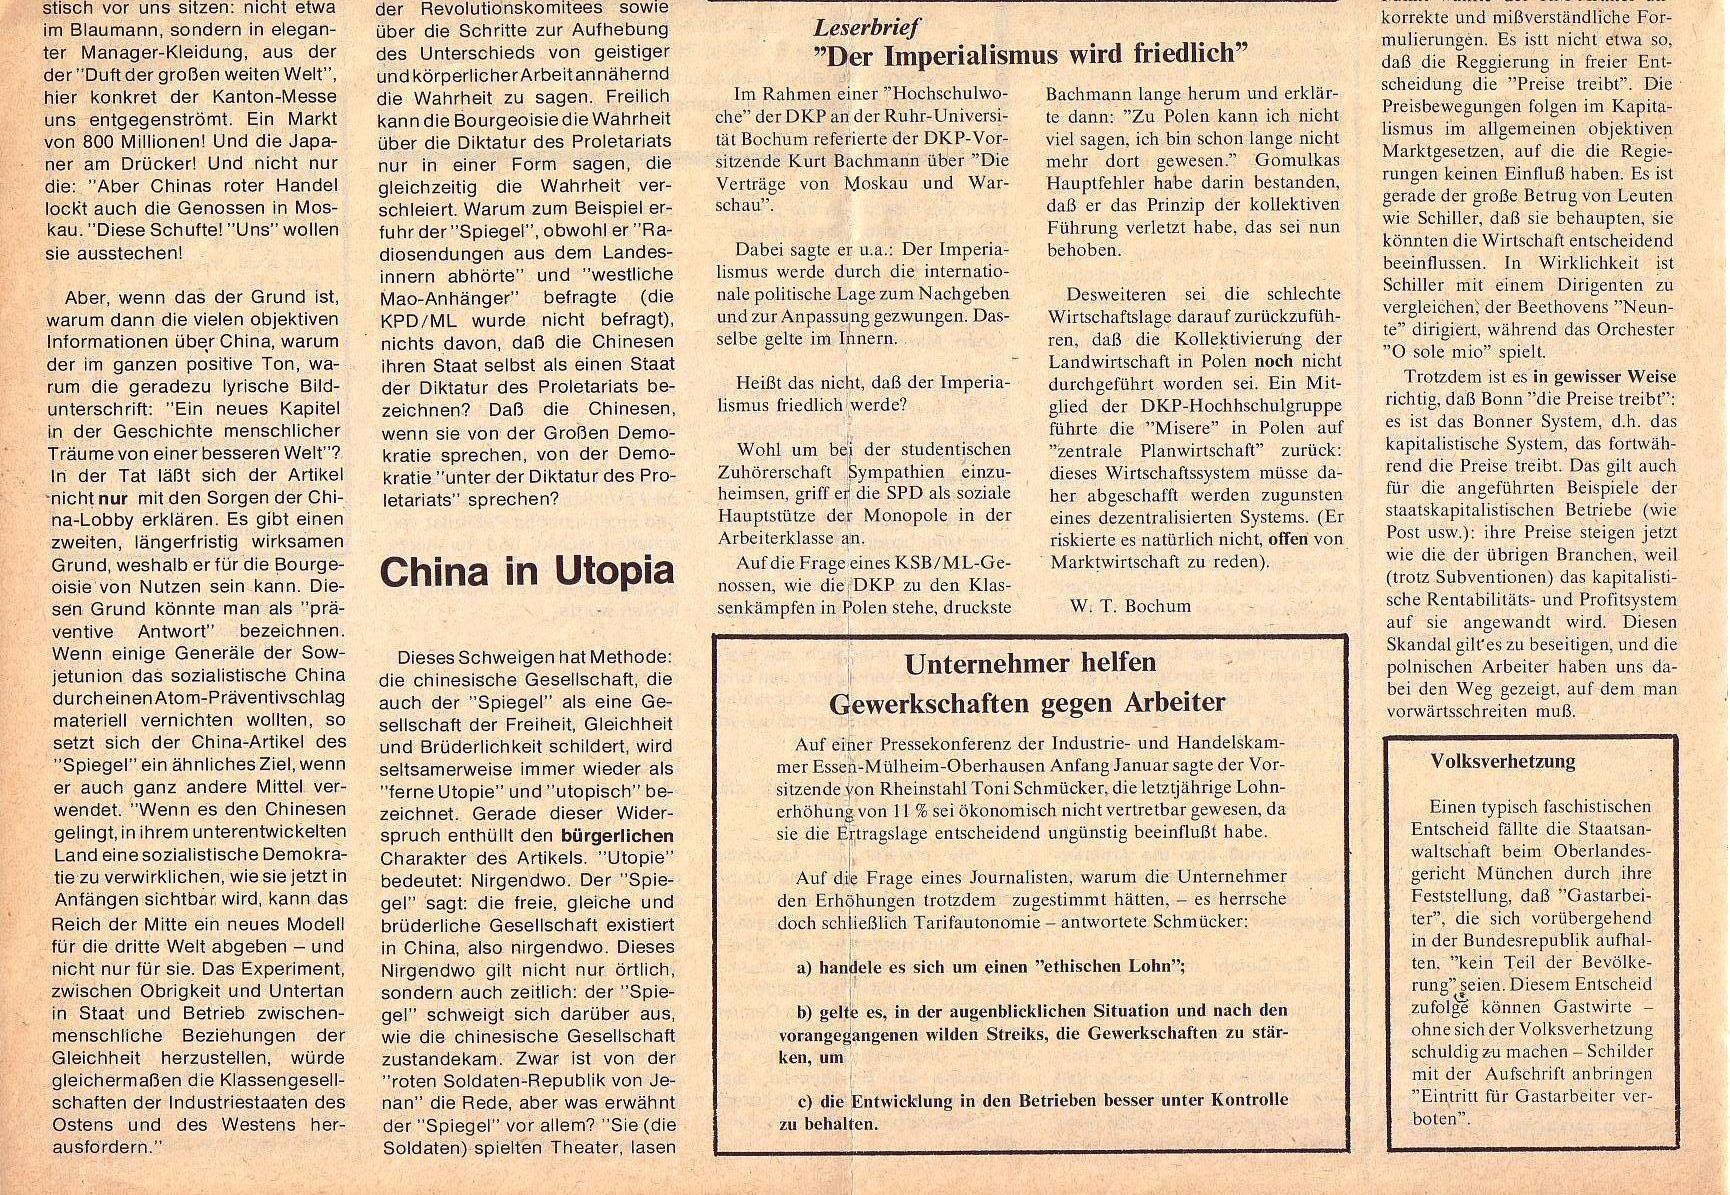 Roter Morgen, 5. Jg., Februar 1971, Nr. 2, Seite 8b